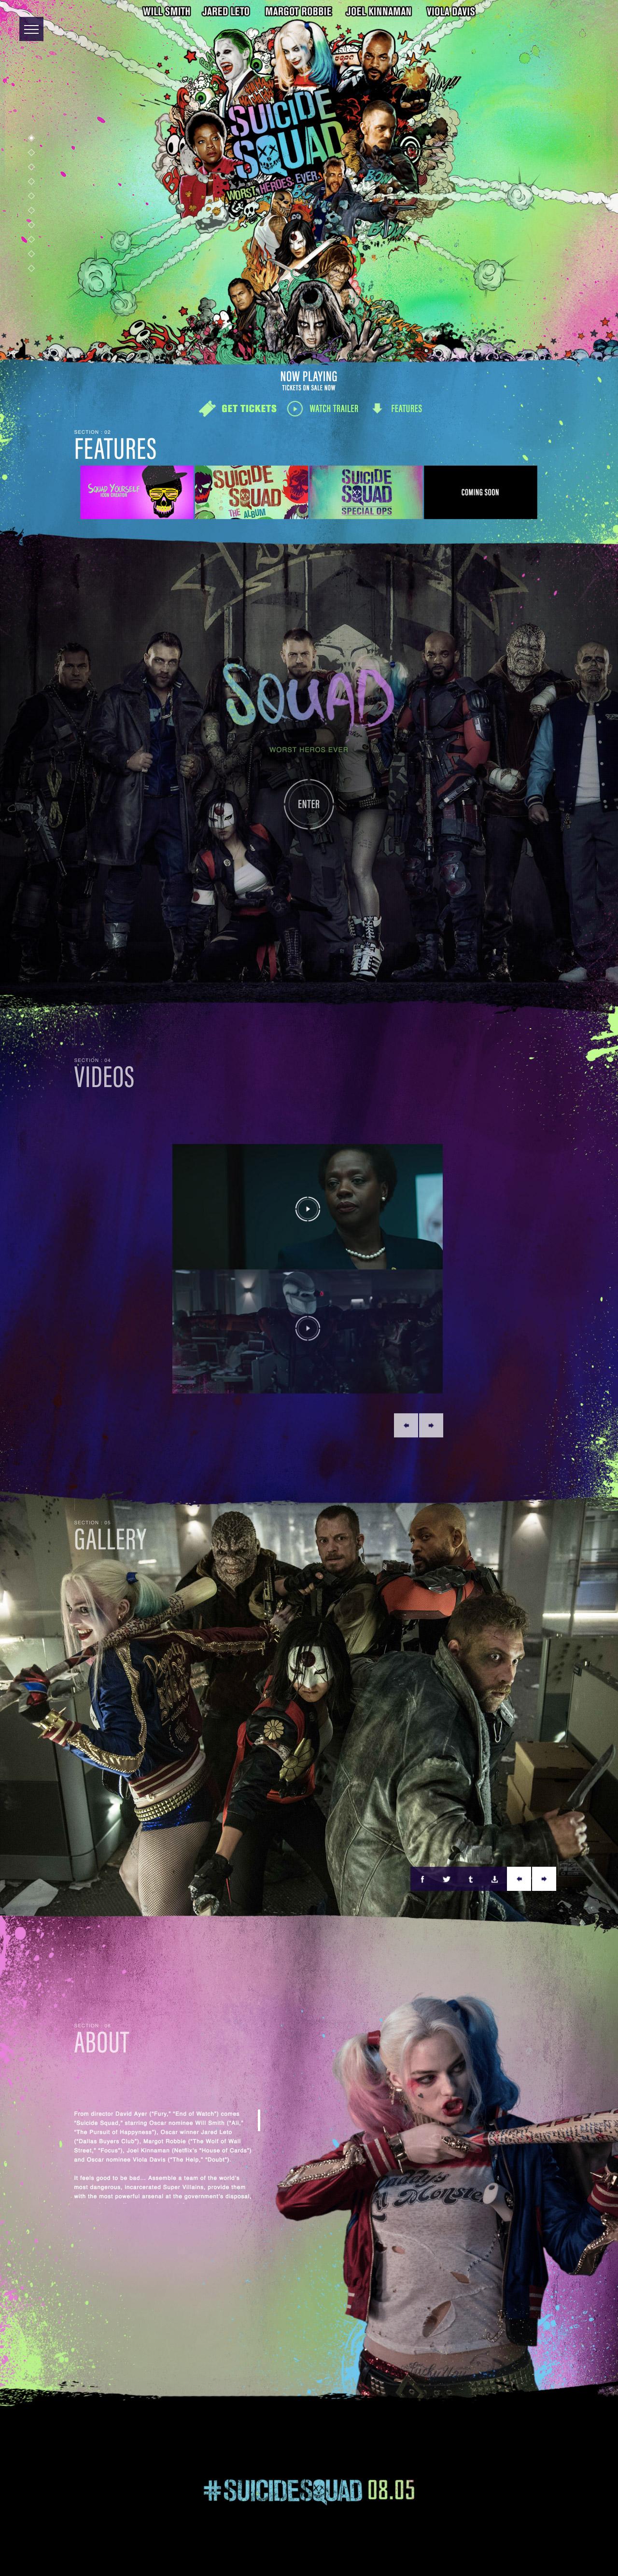 Suicide Squad Big Screenshot